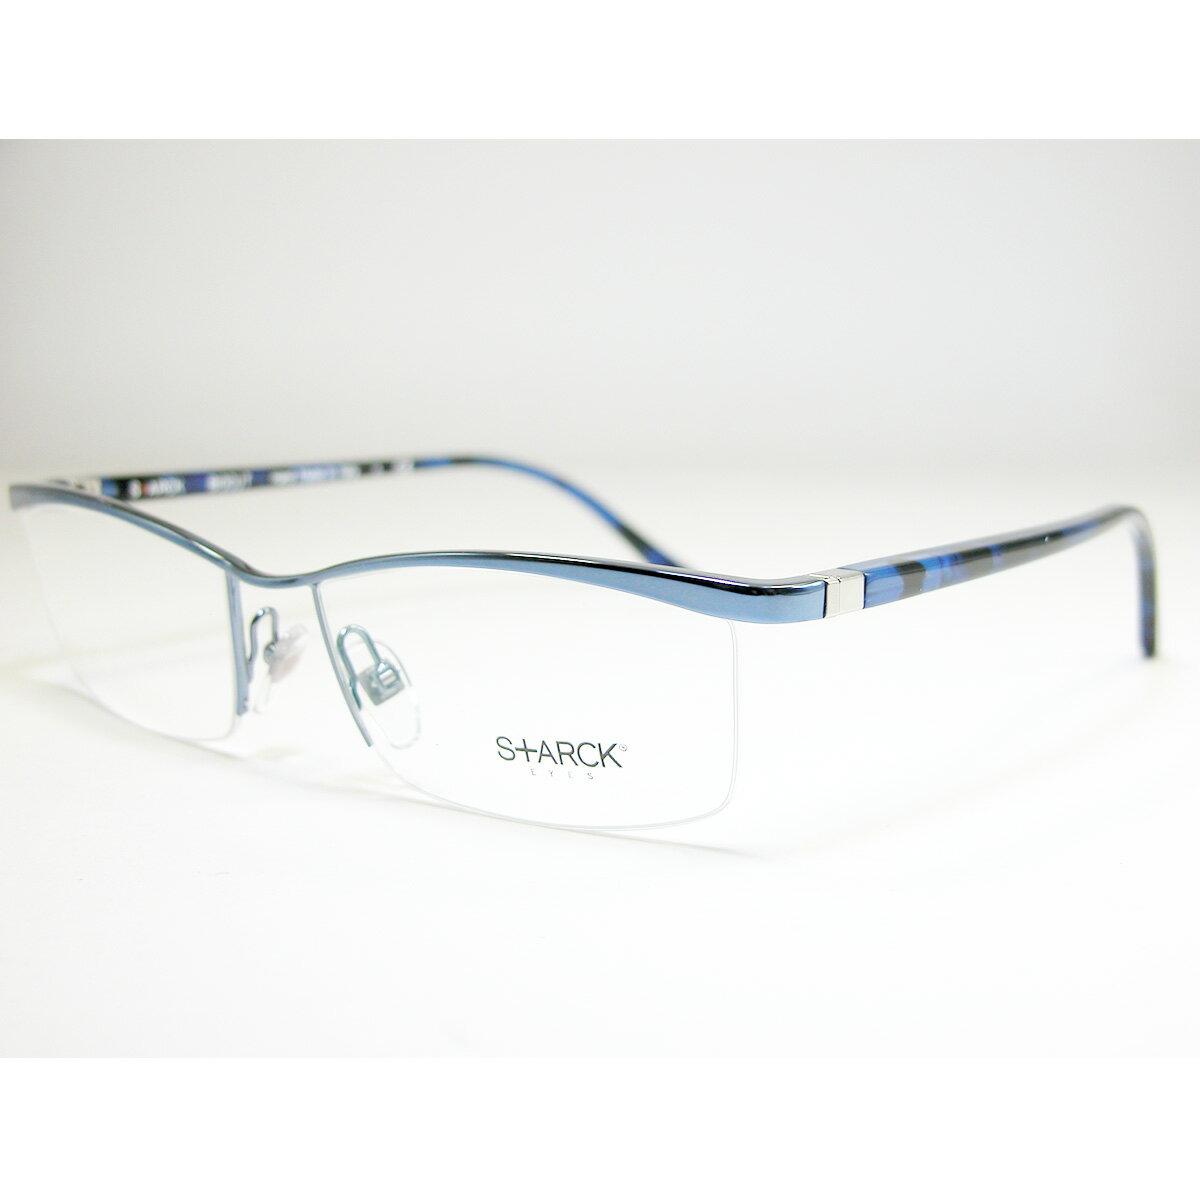 alain mikli アランミクリ メガネSTARCK EYES (スタルクアイズ) SH9901 カラー0057(正規品)【楽ギフ_包装】 メンズ メガネ サングラス 眼鏡【ありがとう】【店頭受取対応商品】